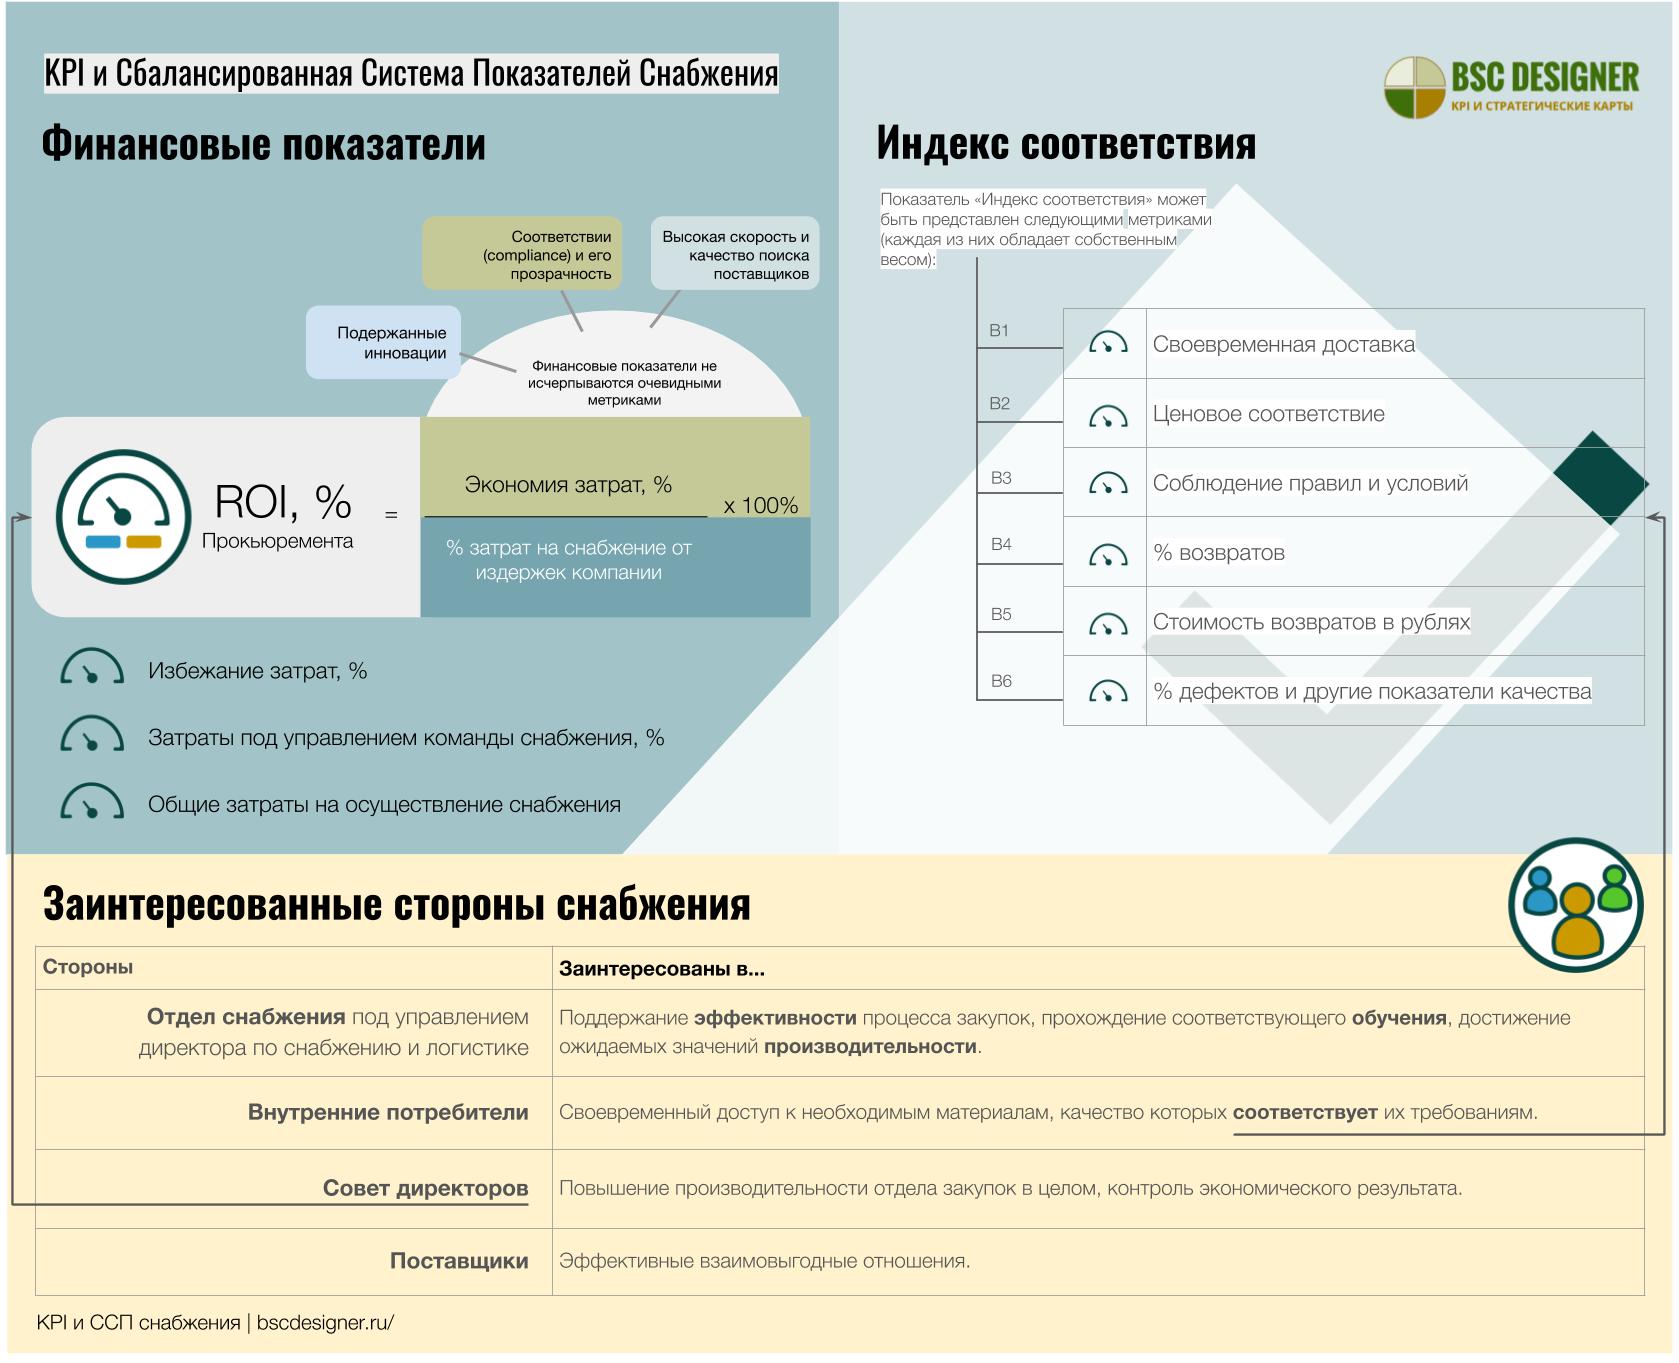 KPI закупок и система показателей прокьюремента